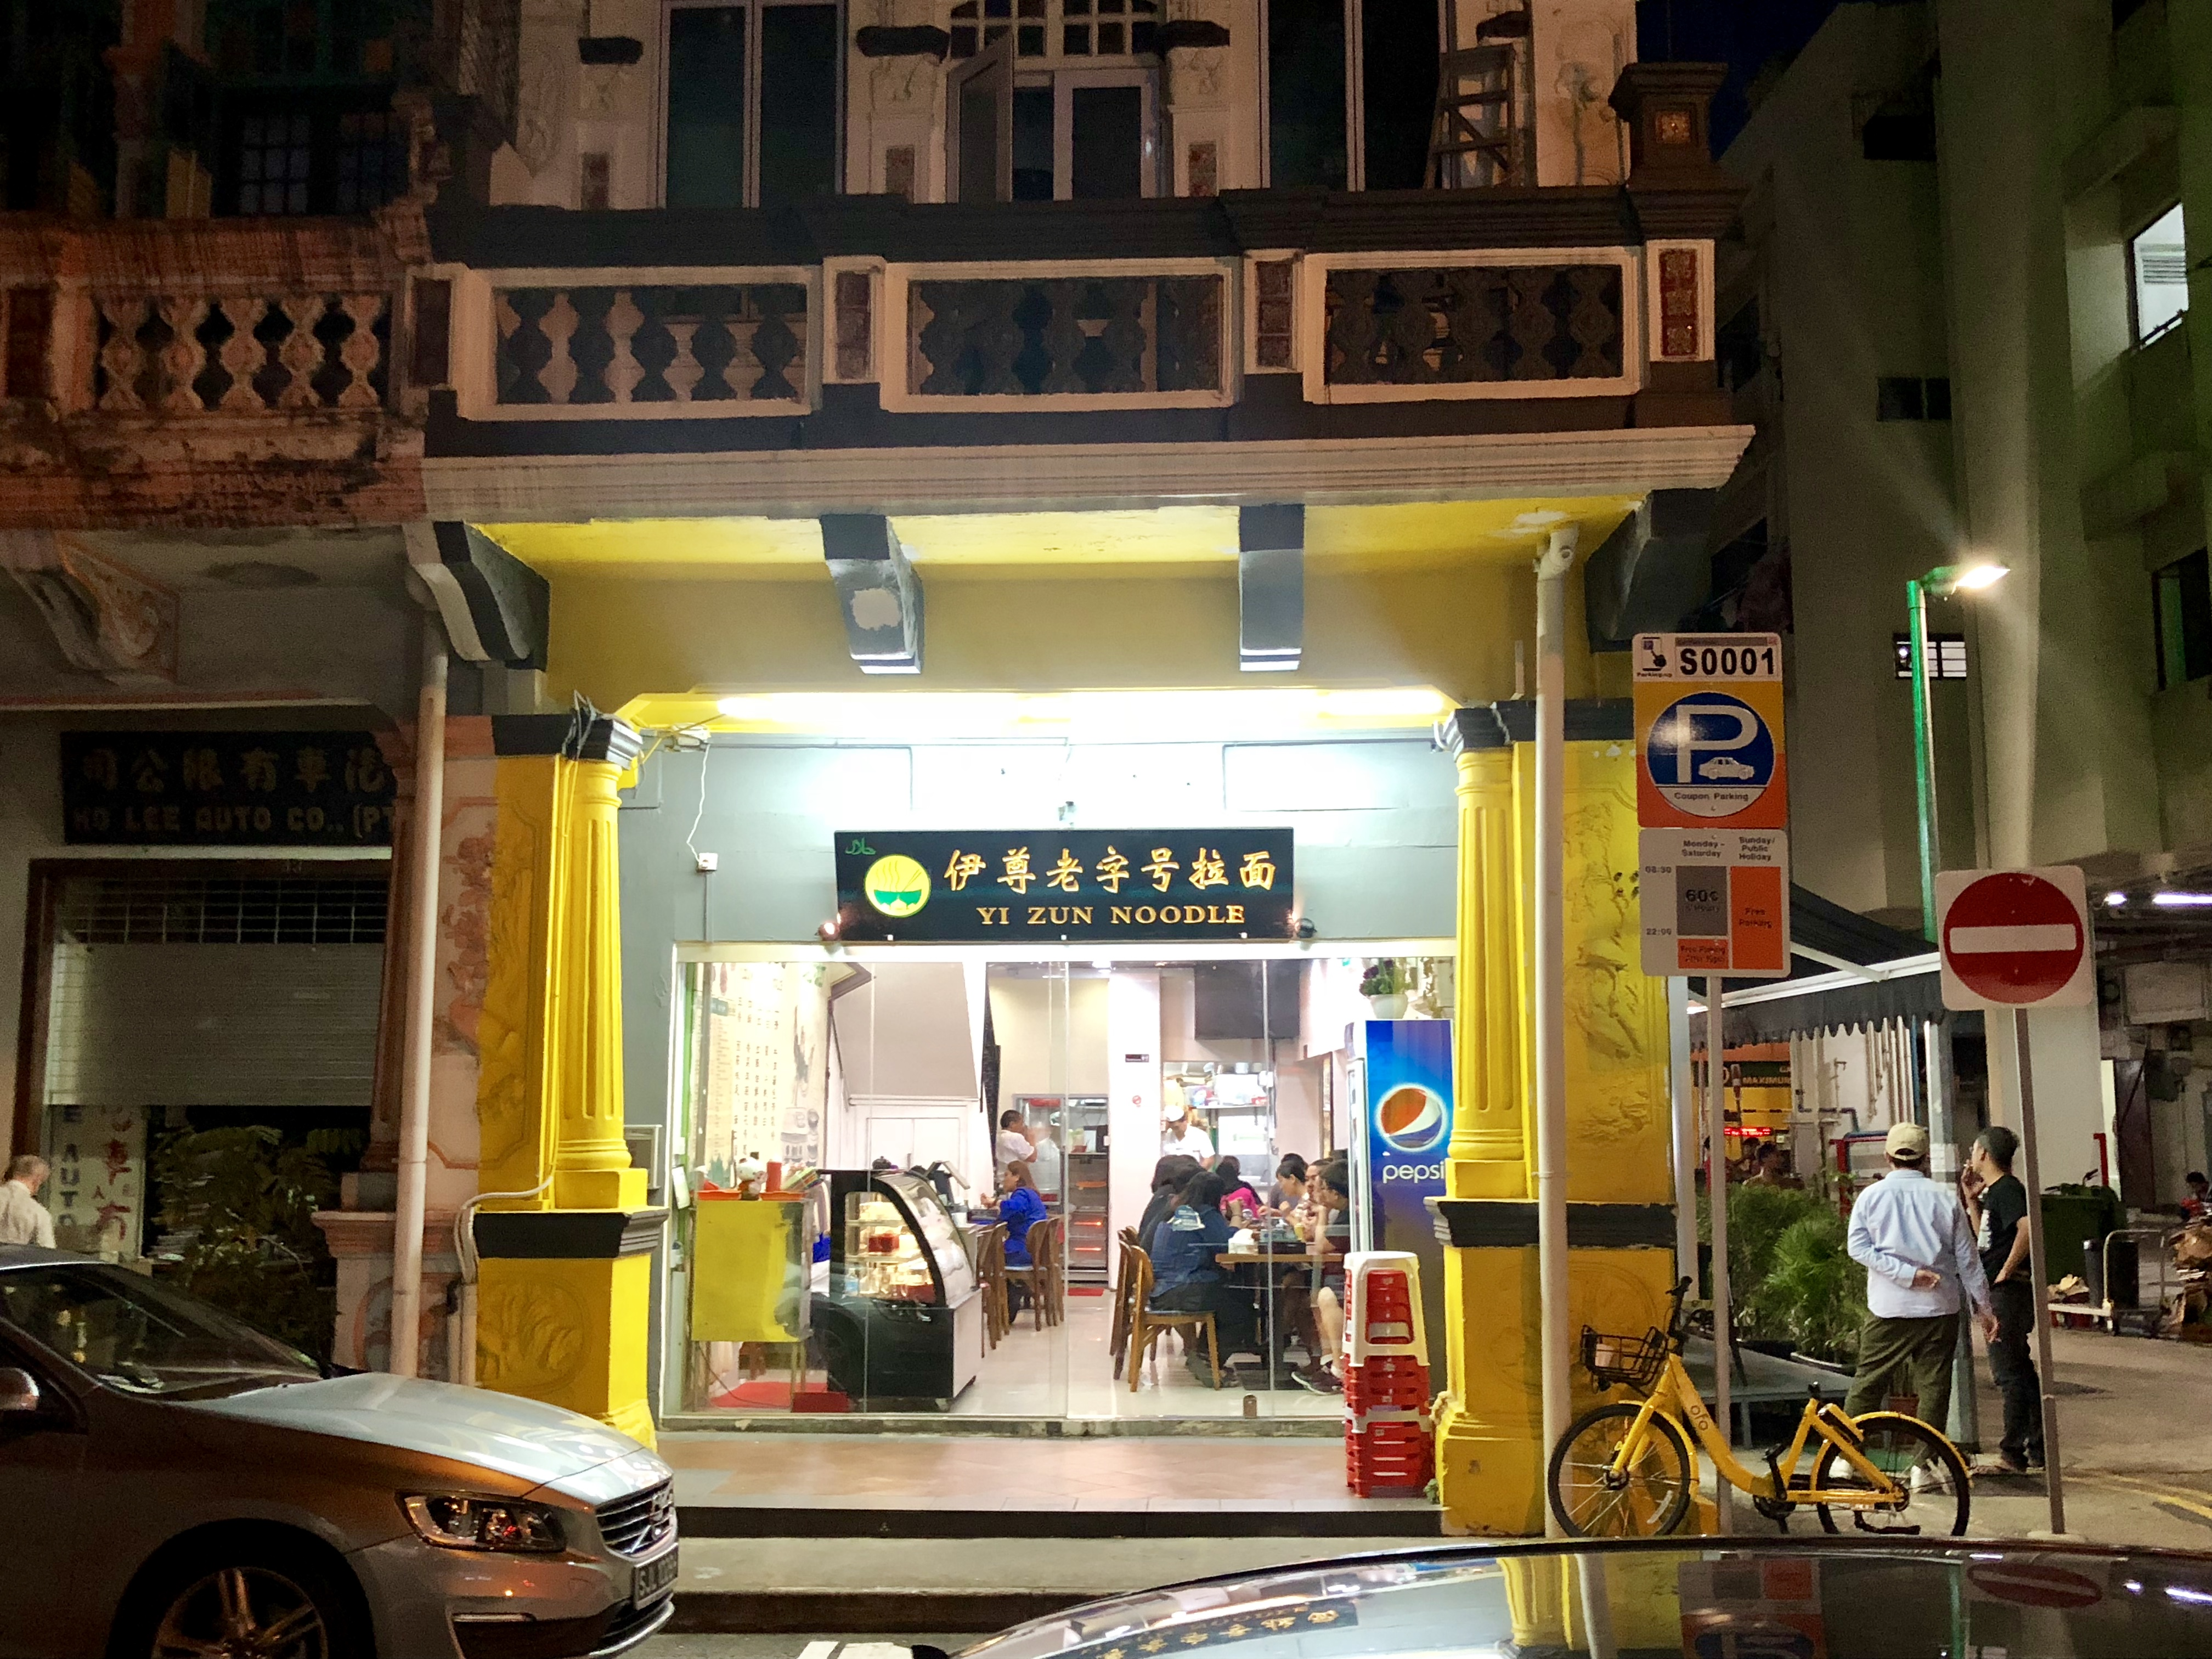 Yi_Zun_Noodle_Entrance_Storefront